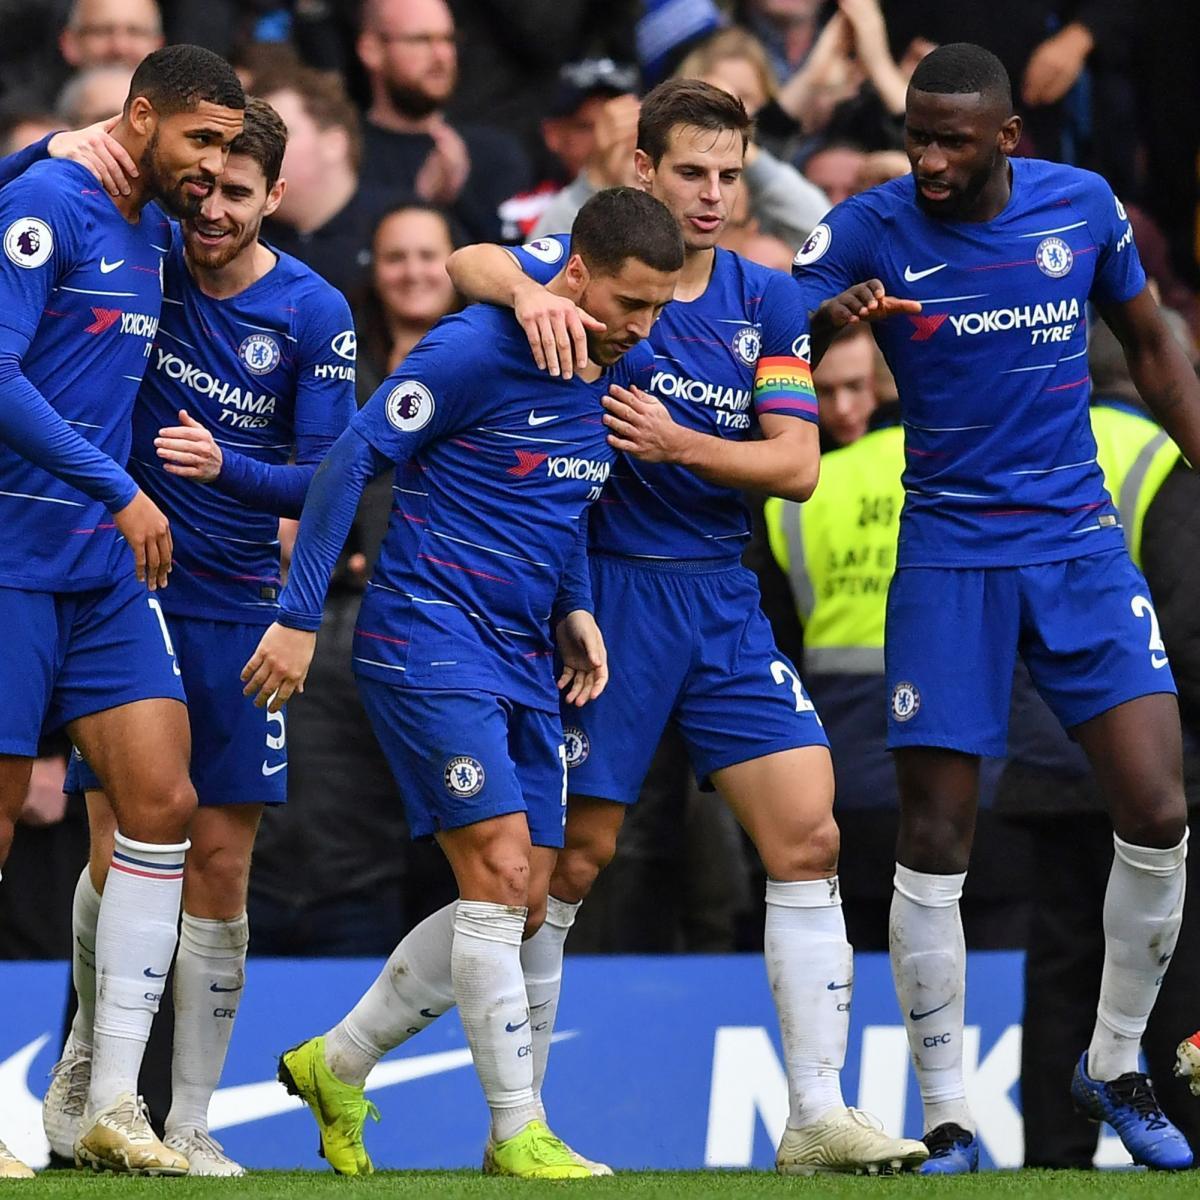 Tottenham 3 Fulham 1 Match Highlights Harry Kane Scores: Pedro, Ruben Loftus-Cheek Lead Chelsea Past Struggling